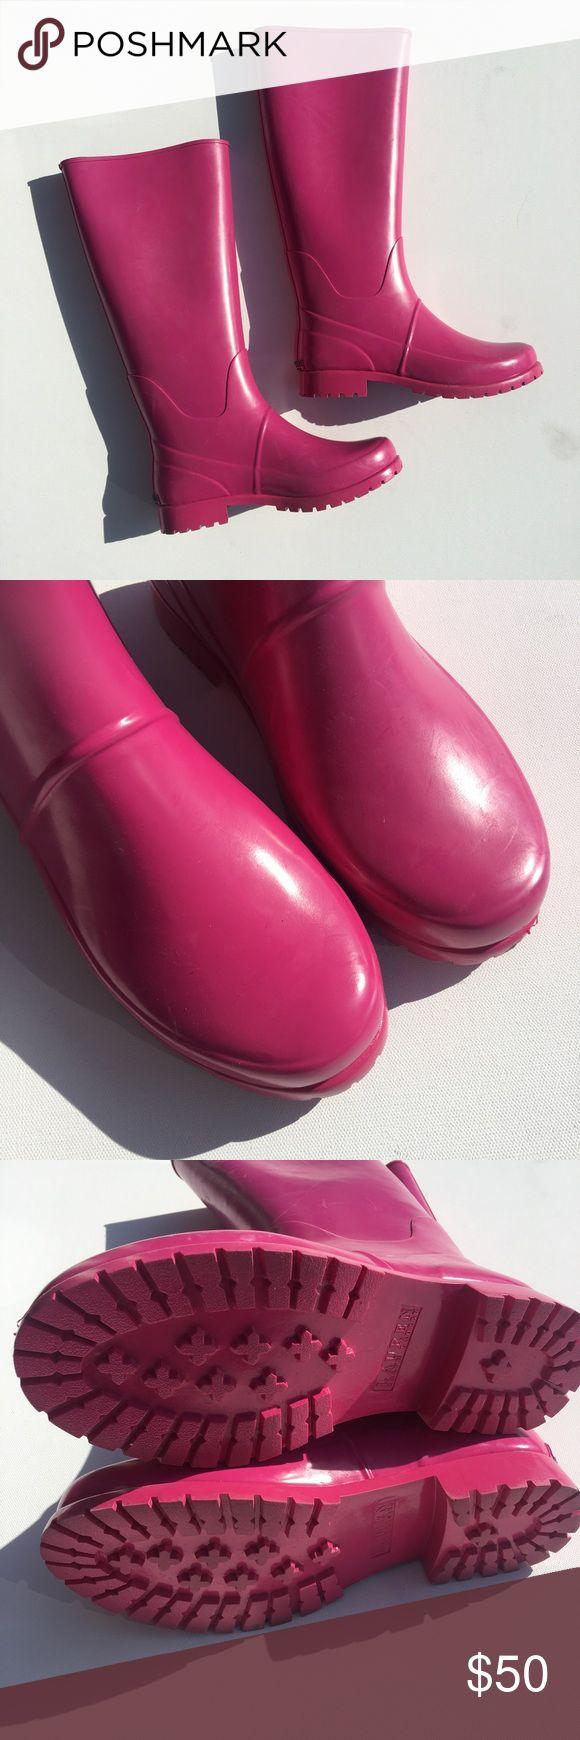 New Ralph Lauren Bethania Rain Boots Pink Rubber Brand New Ralph Lauren Pink Rain Boots, may have slight blemishes from storage. C83 Ralph Lauren Shoes Winter & Rain Boots